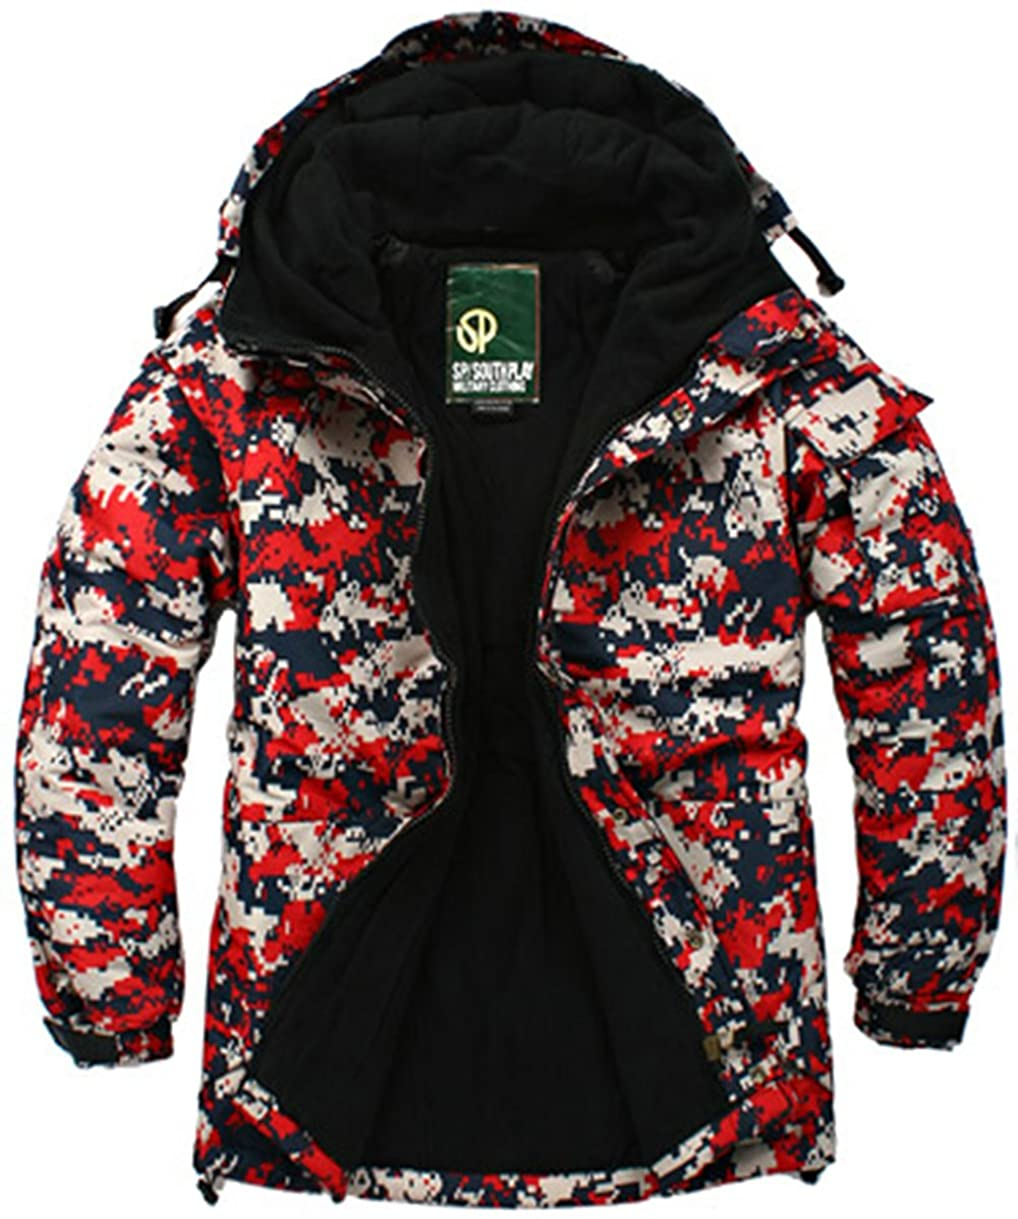 Mens Premium Waterproof Ski Snowboard Suit Wear Jacket Parka Jumper ACU